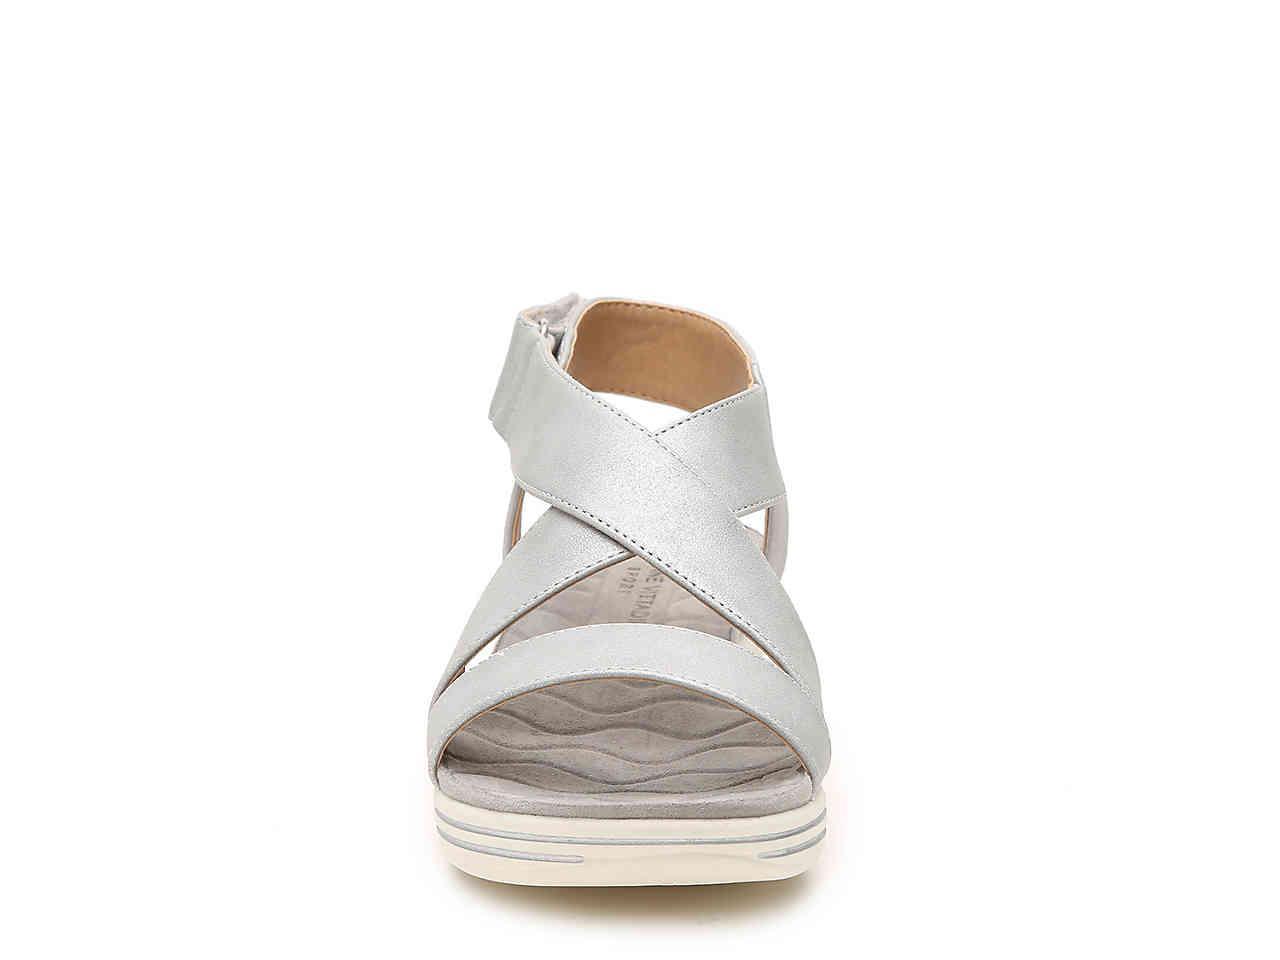 33b01eef01b5 Lyst - Adrienne Vittadini Sport Cory Wedge Sandal in Metallic